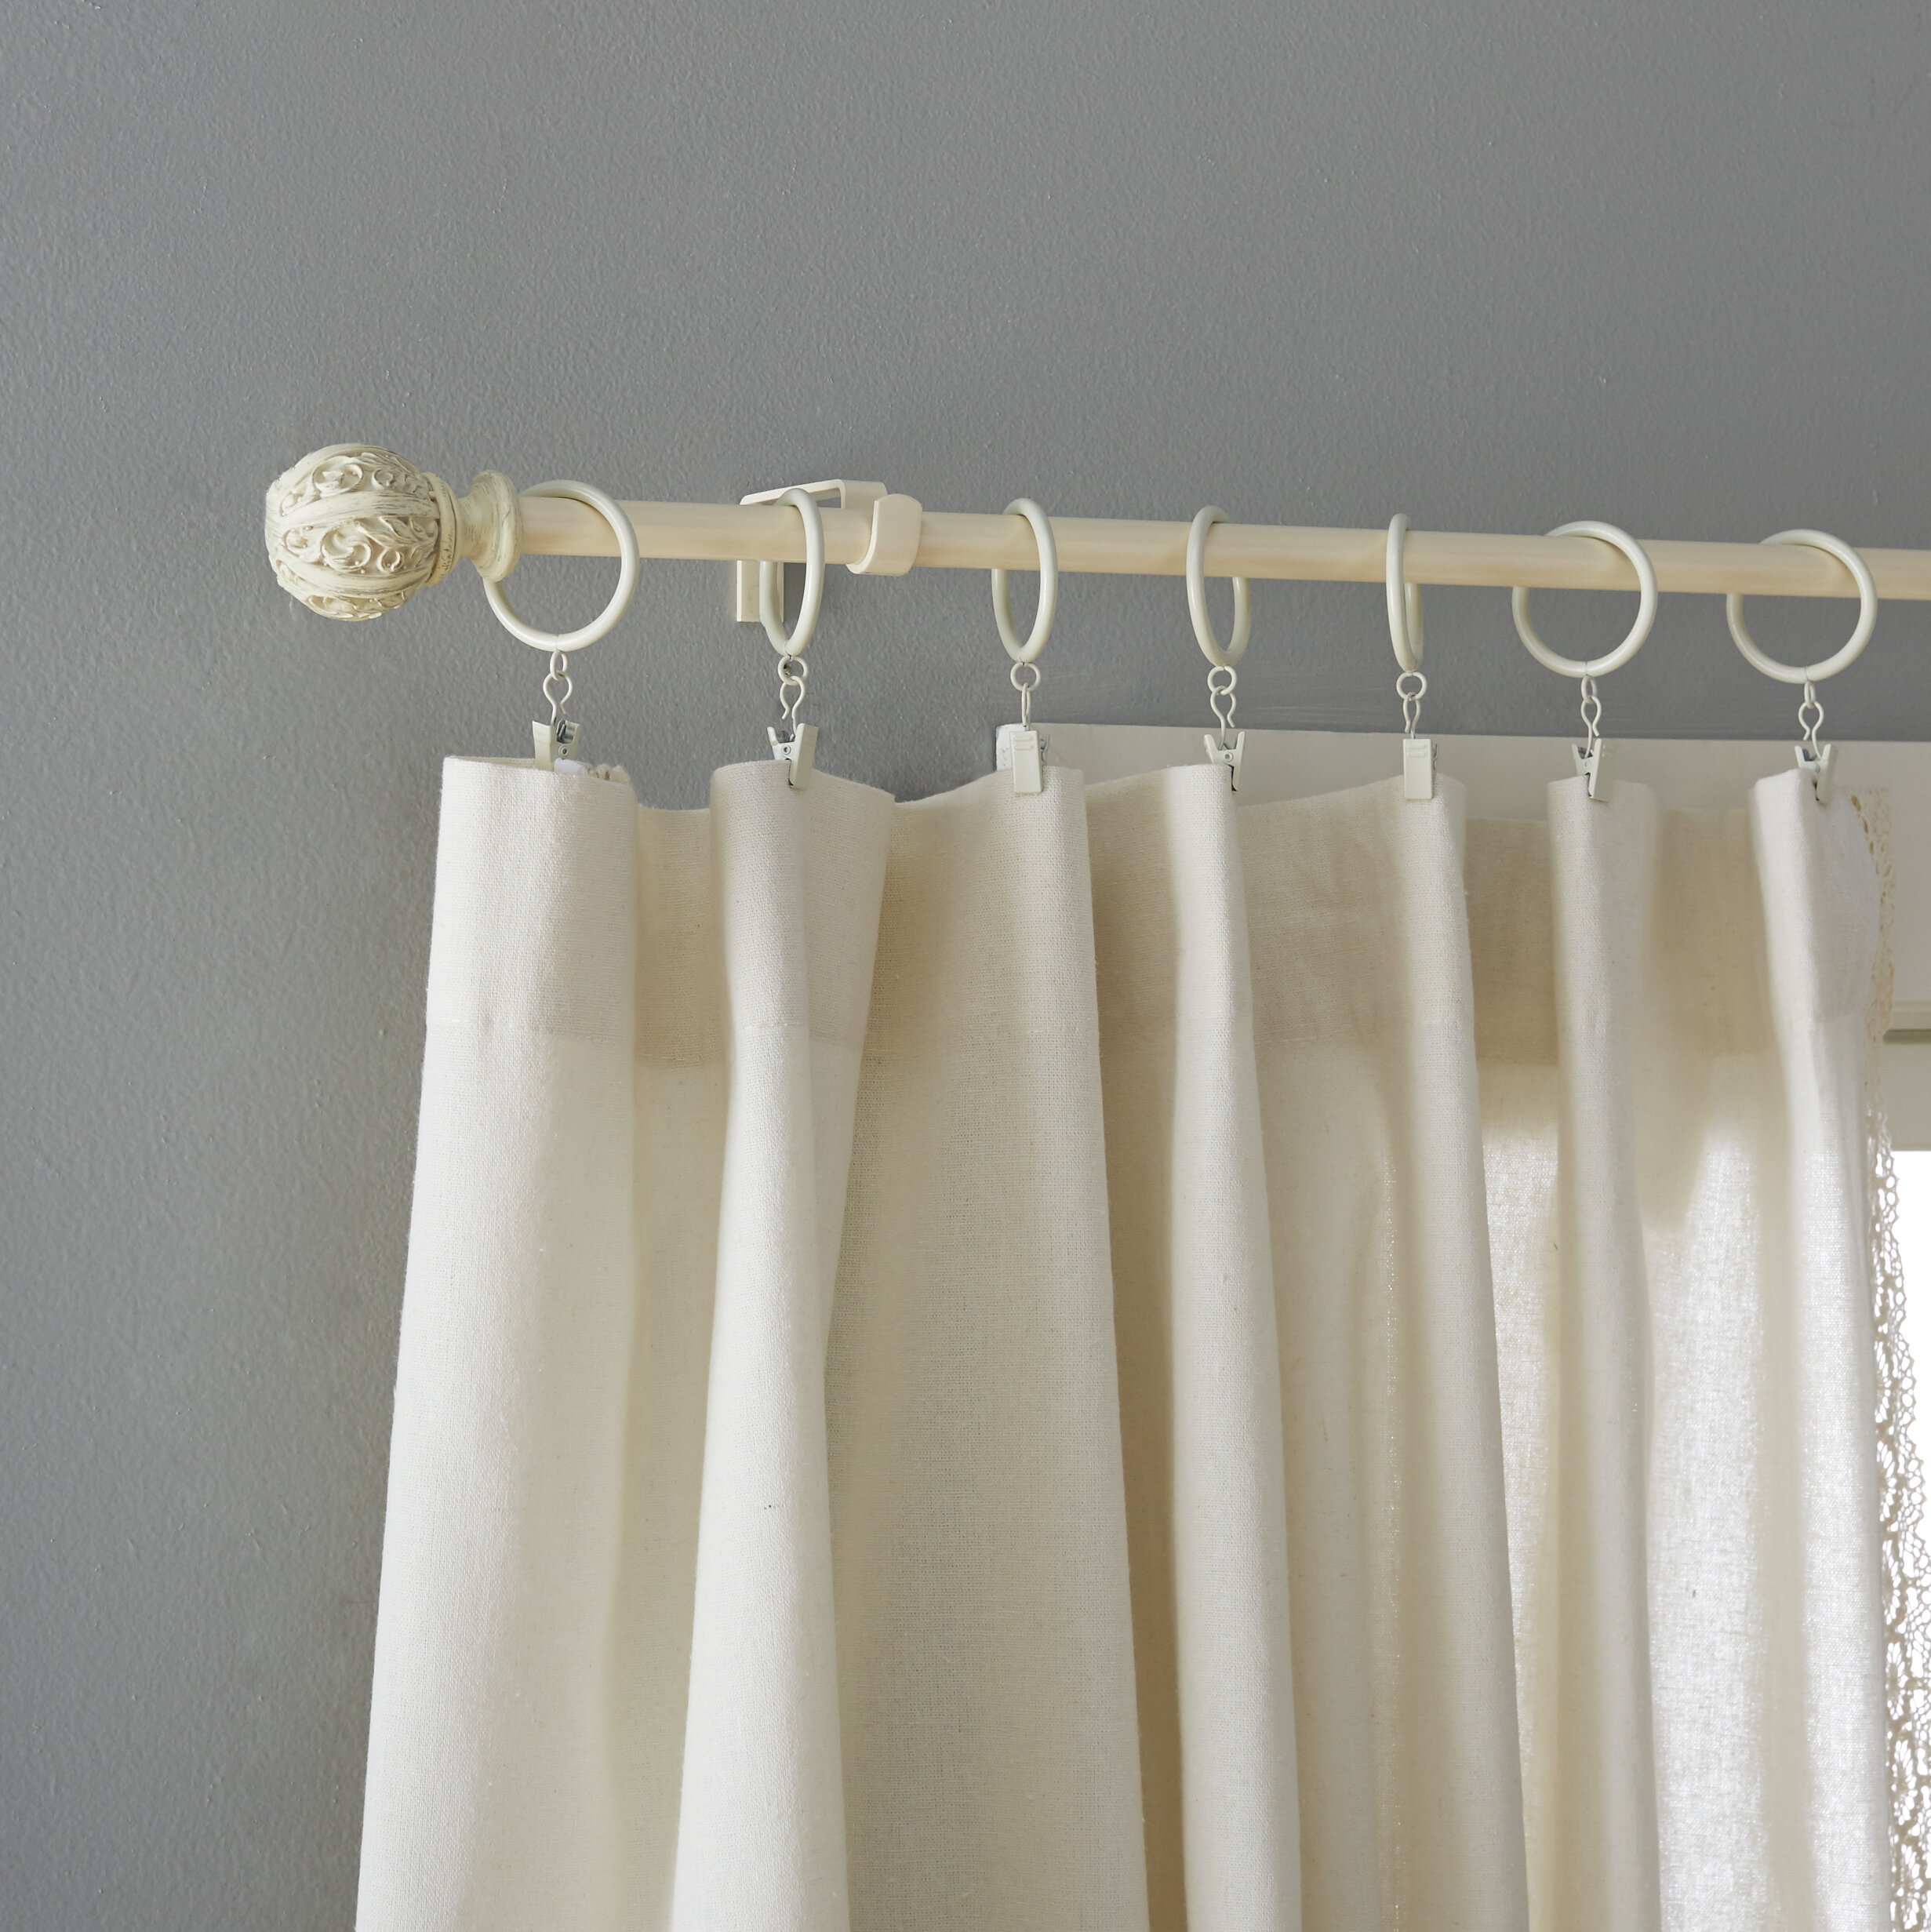 tripartite set to white curtain p rod triple